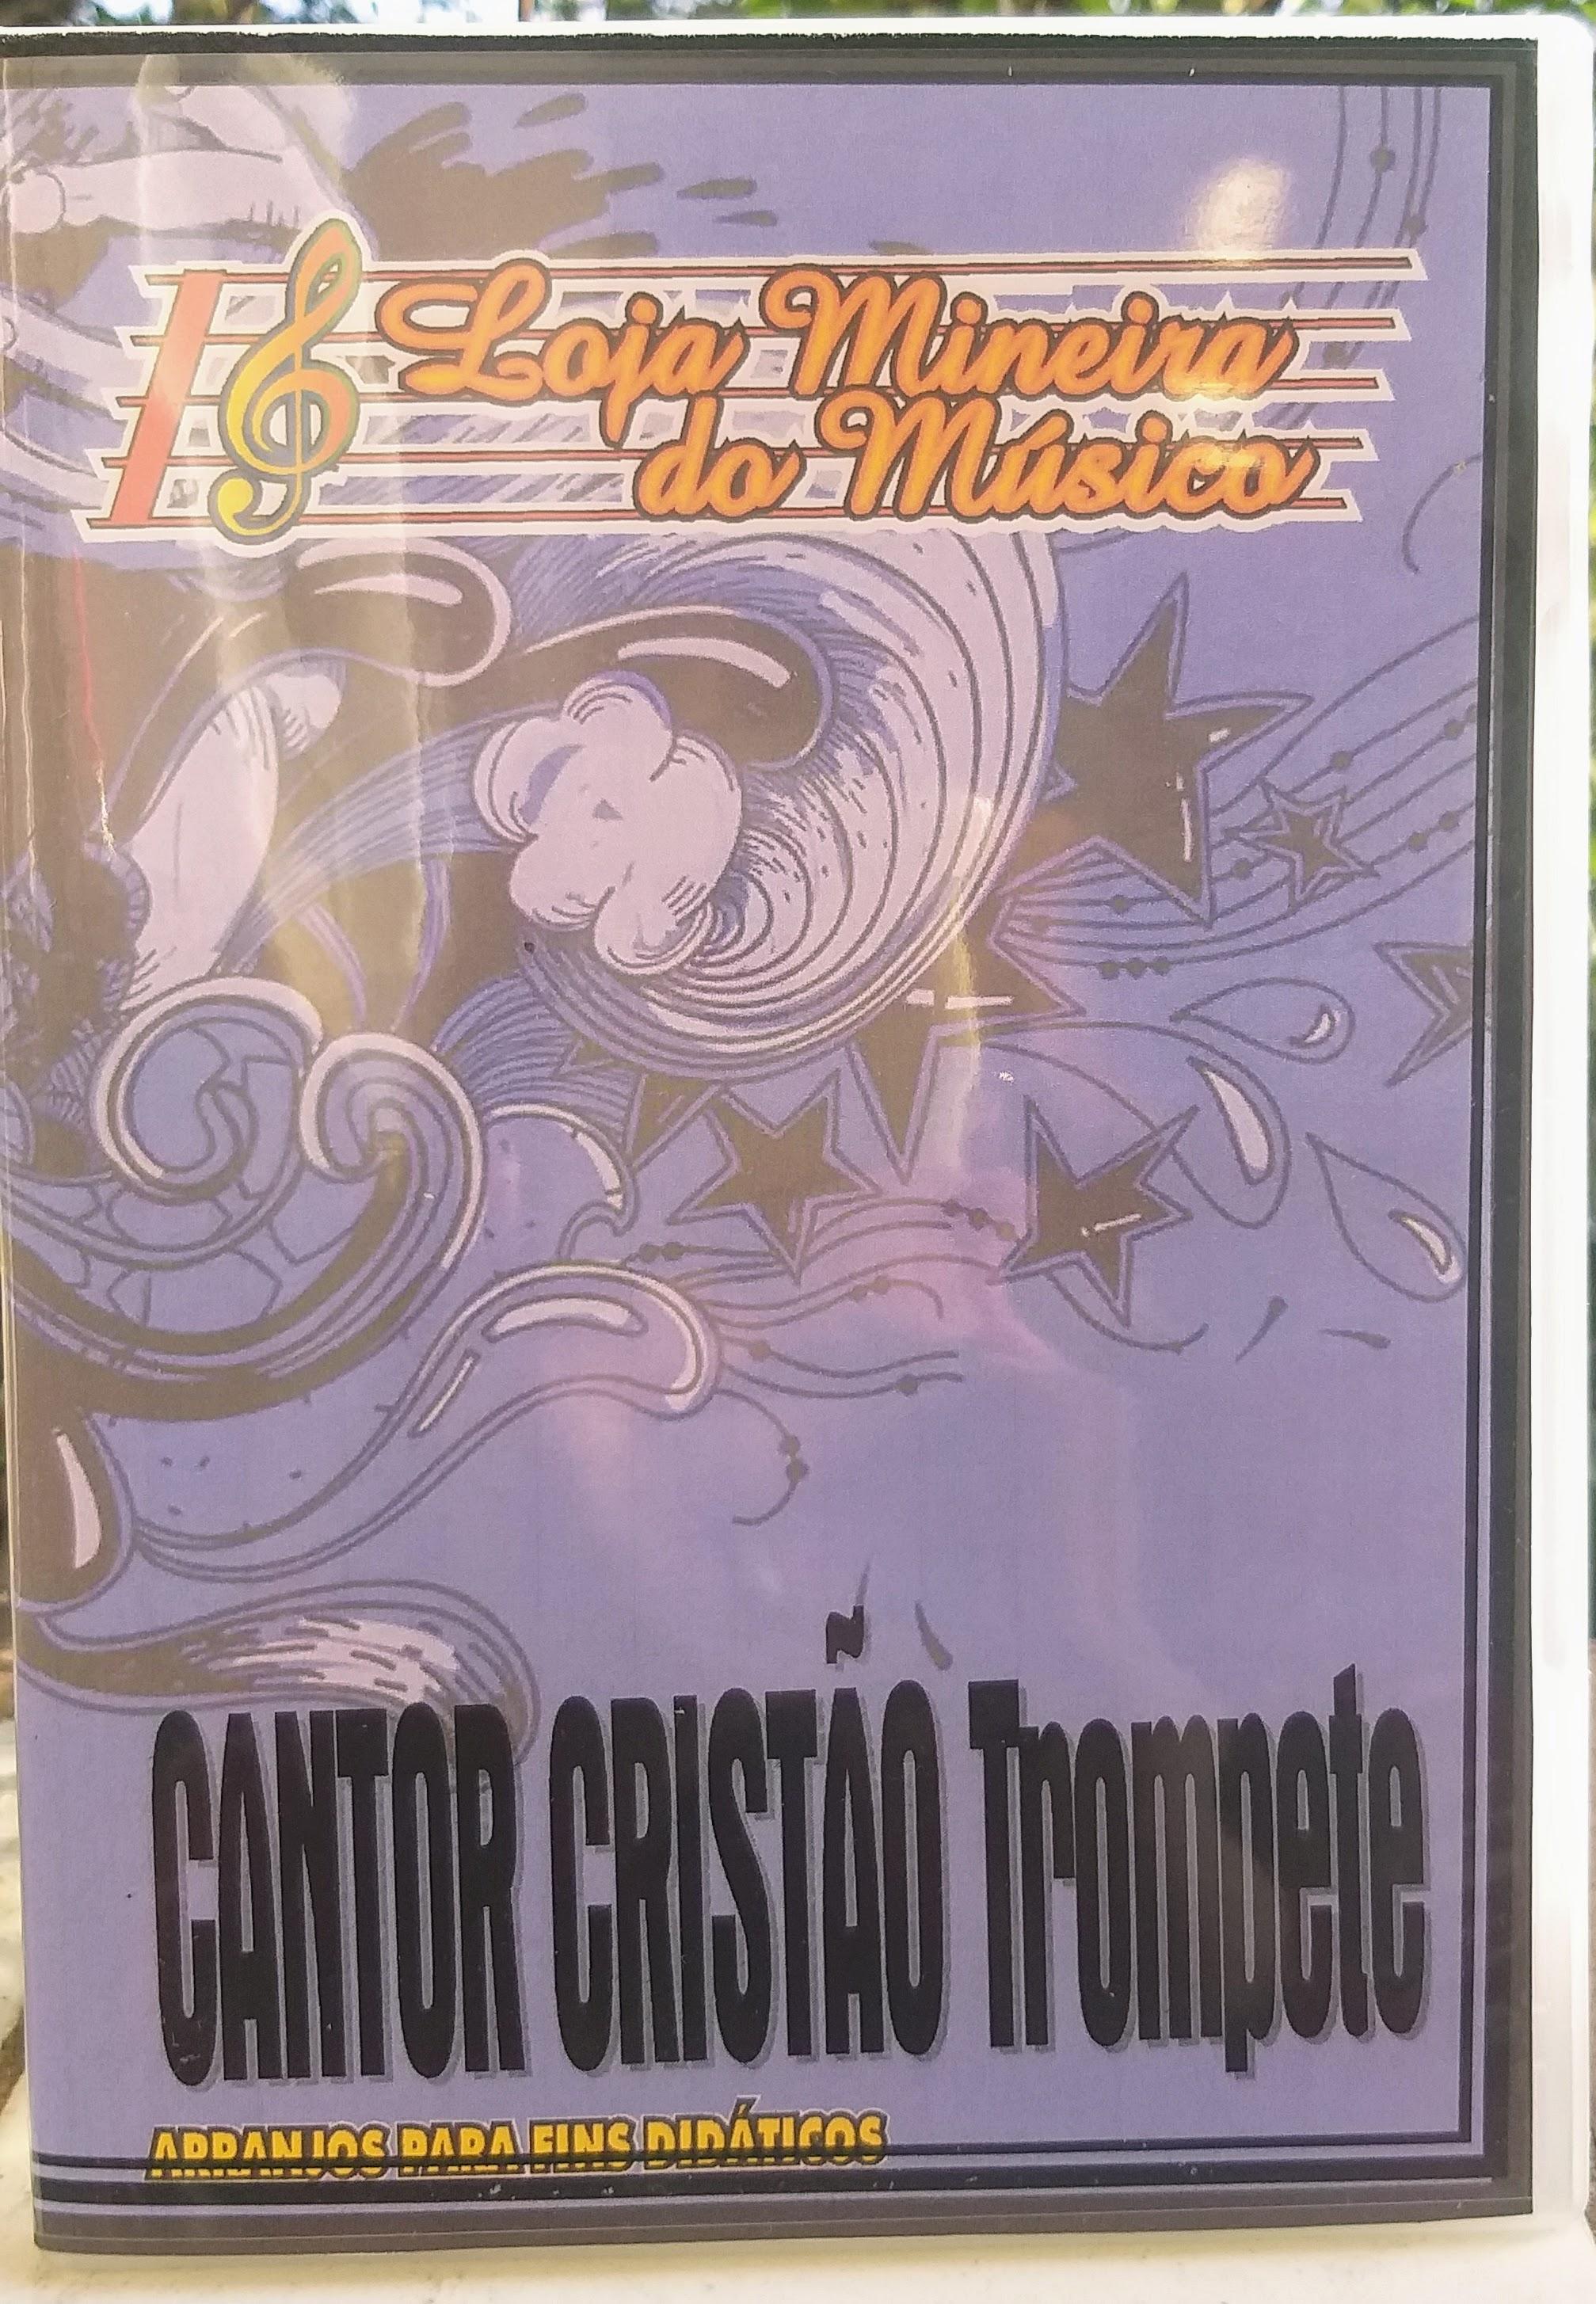 trompete  hinos instrumentais hinos instrumental gospel hinos para meditar e relaxar tocado hinos da harpa para orar